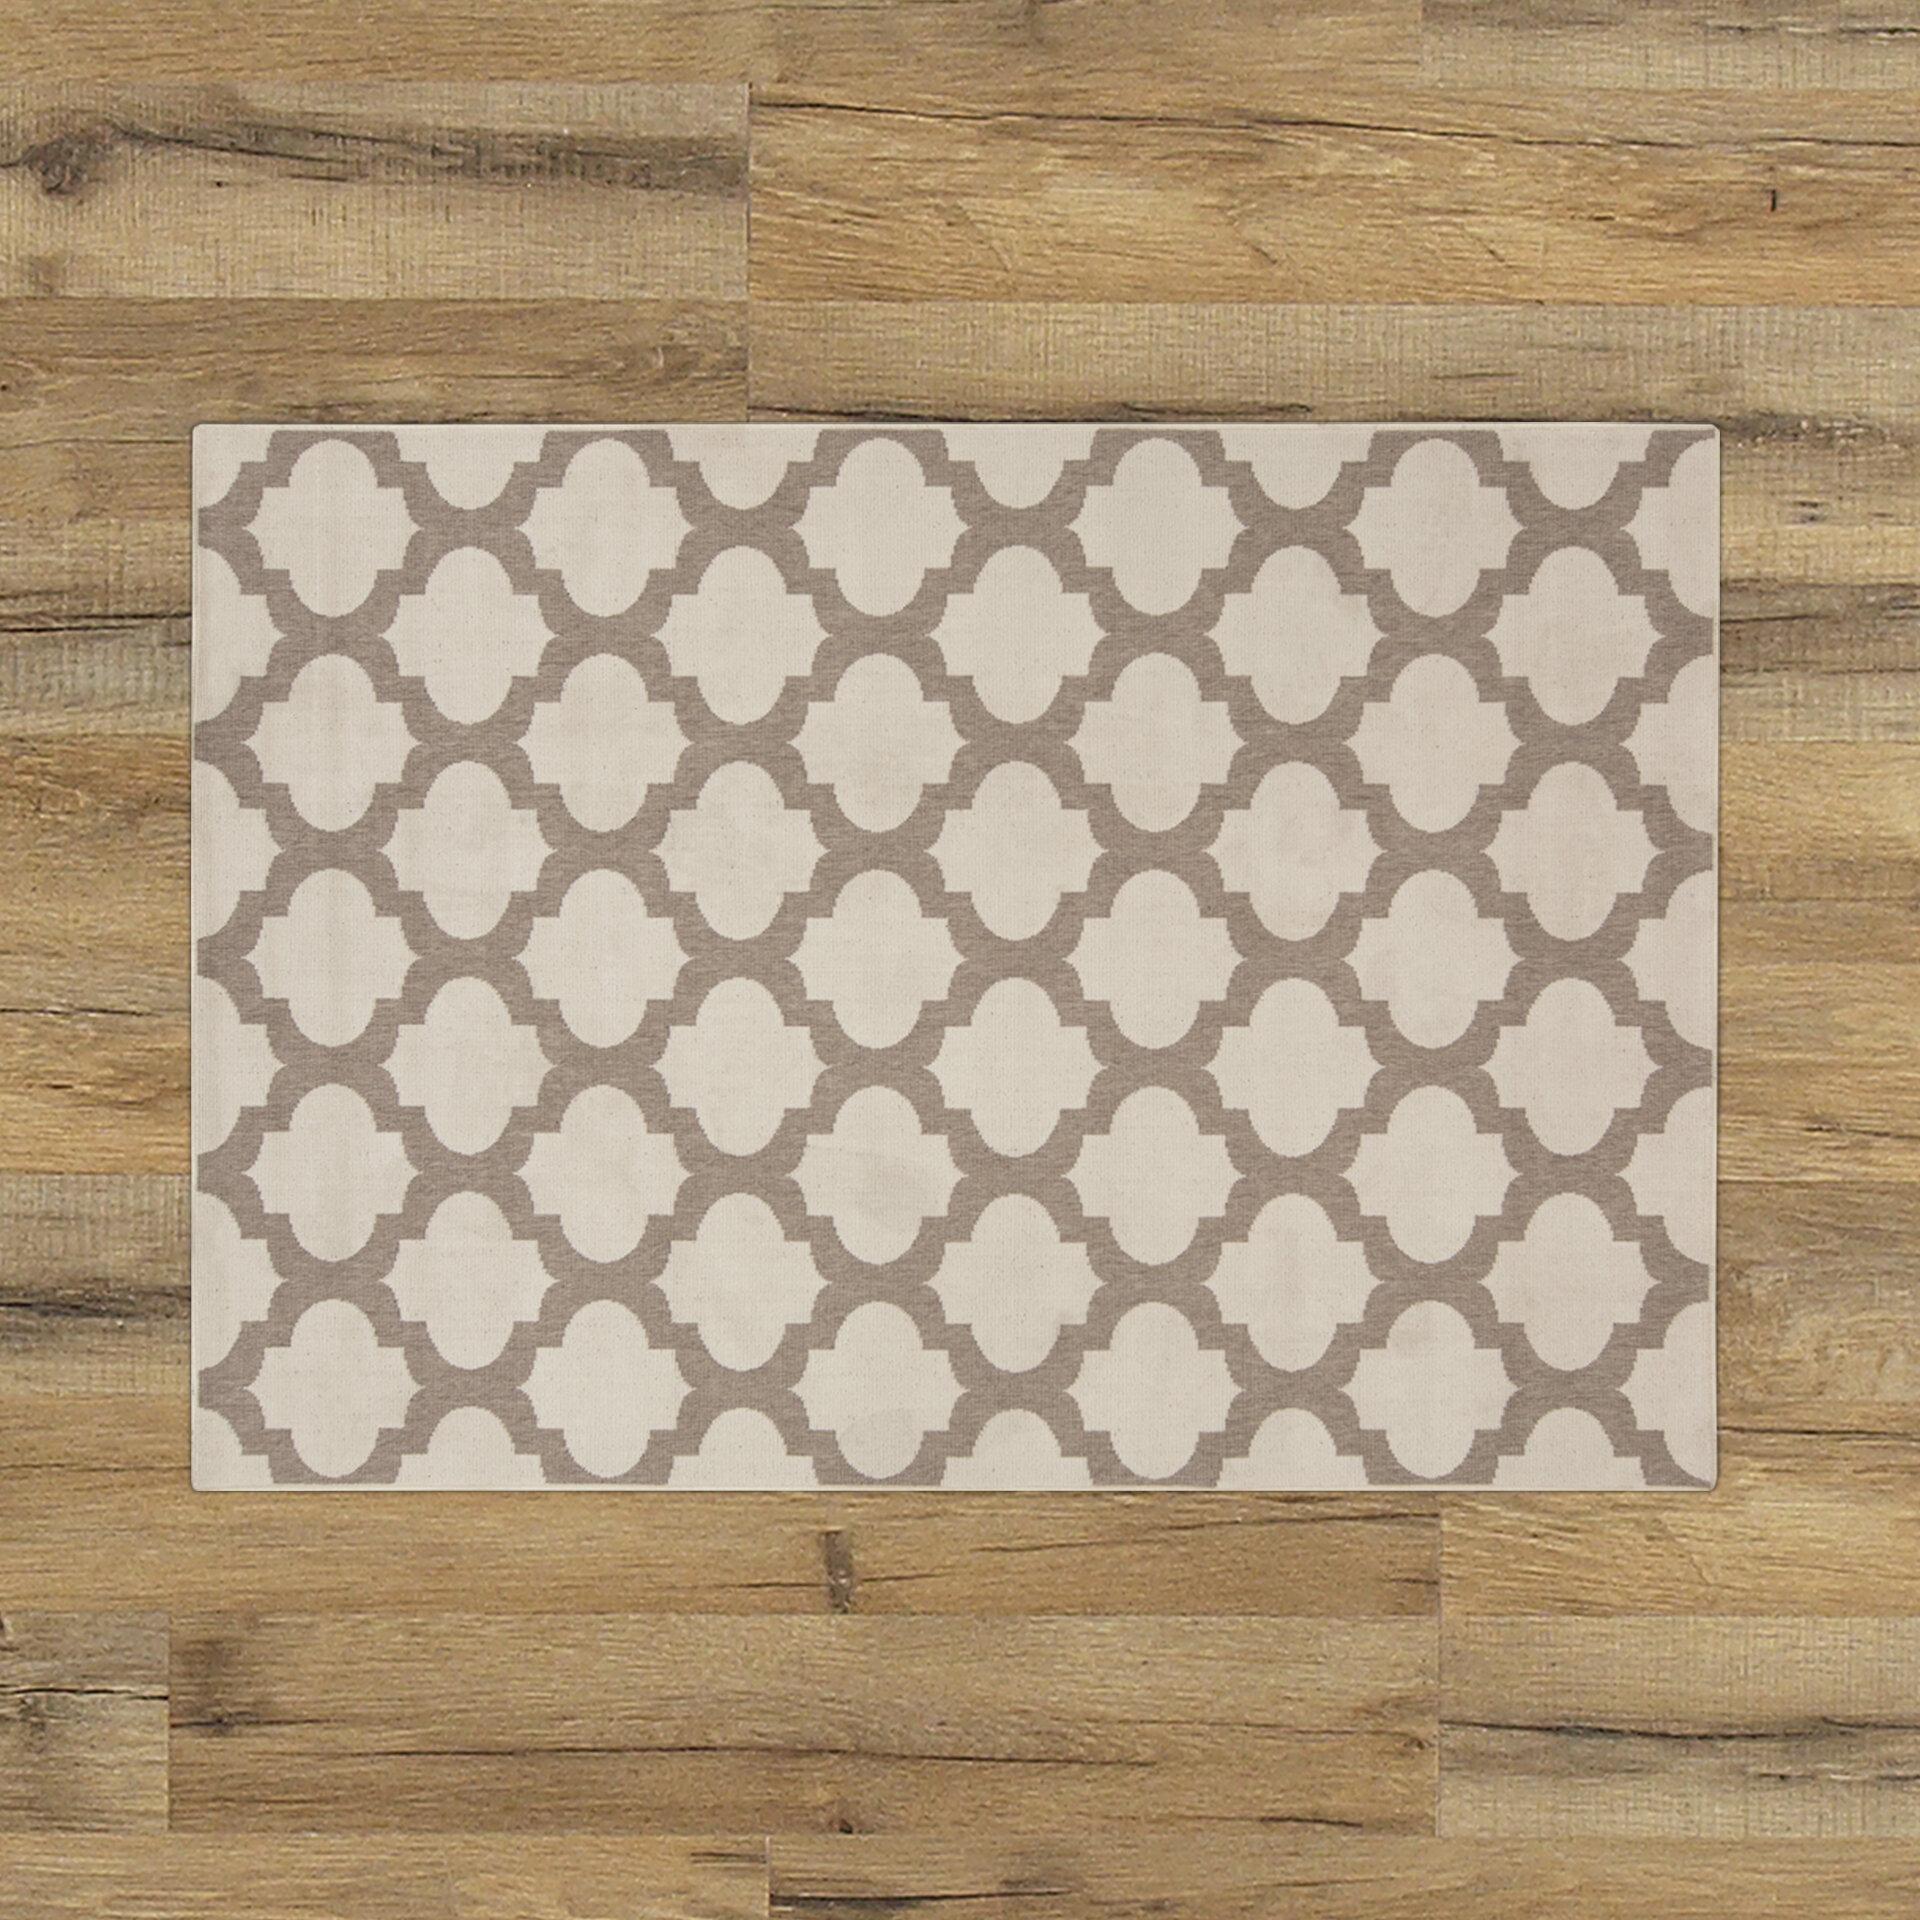 Birch Lane™ Odell Taupe Indoor/Outdoor Area Rug & Reviews | Birch Lane